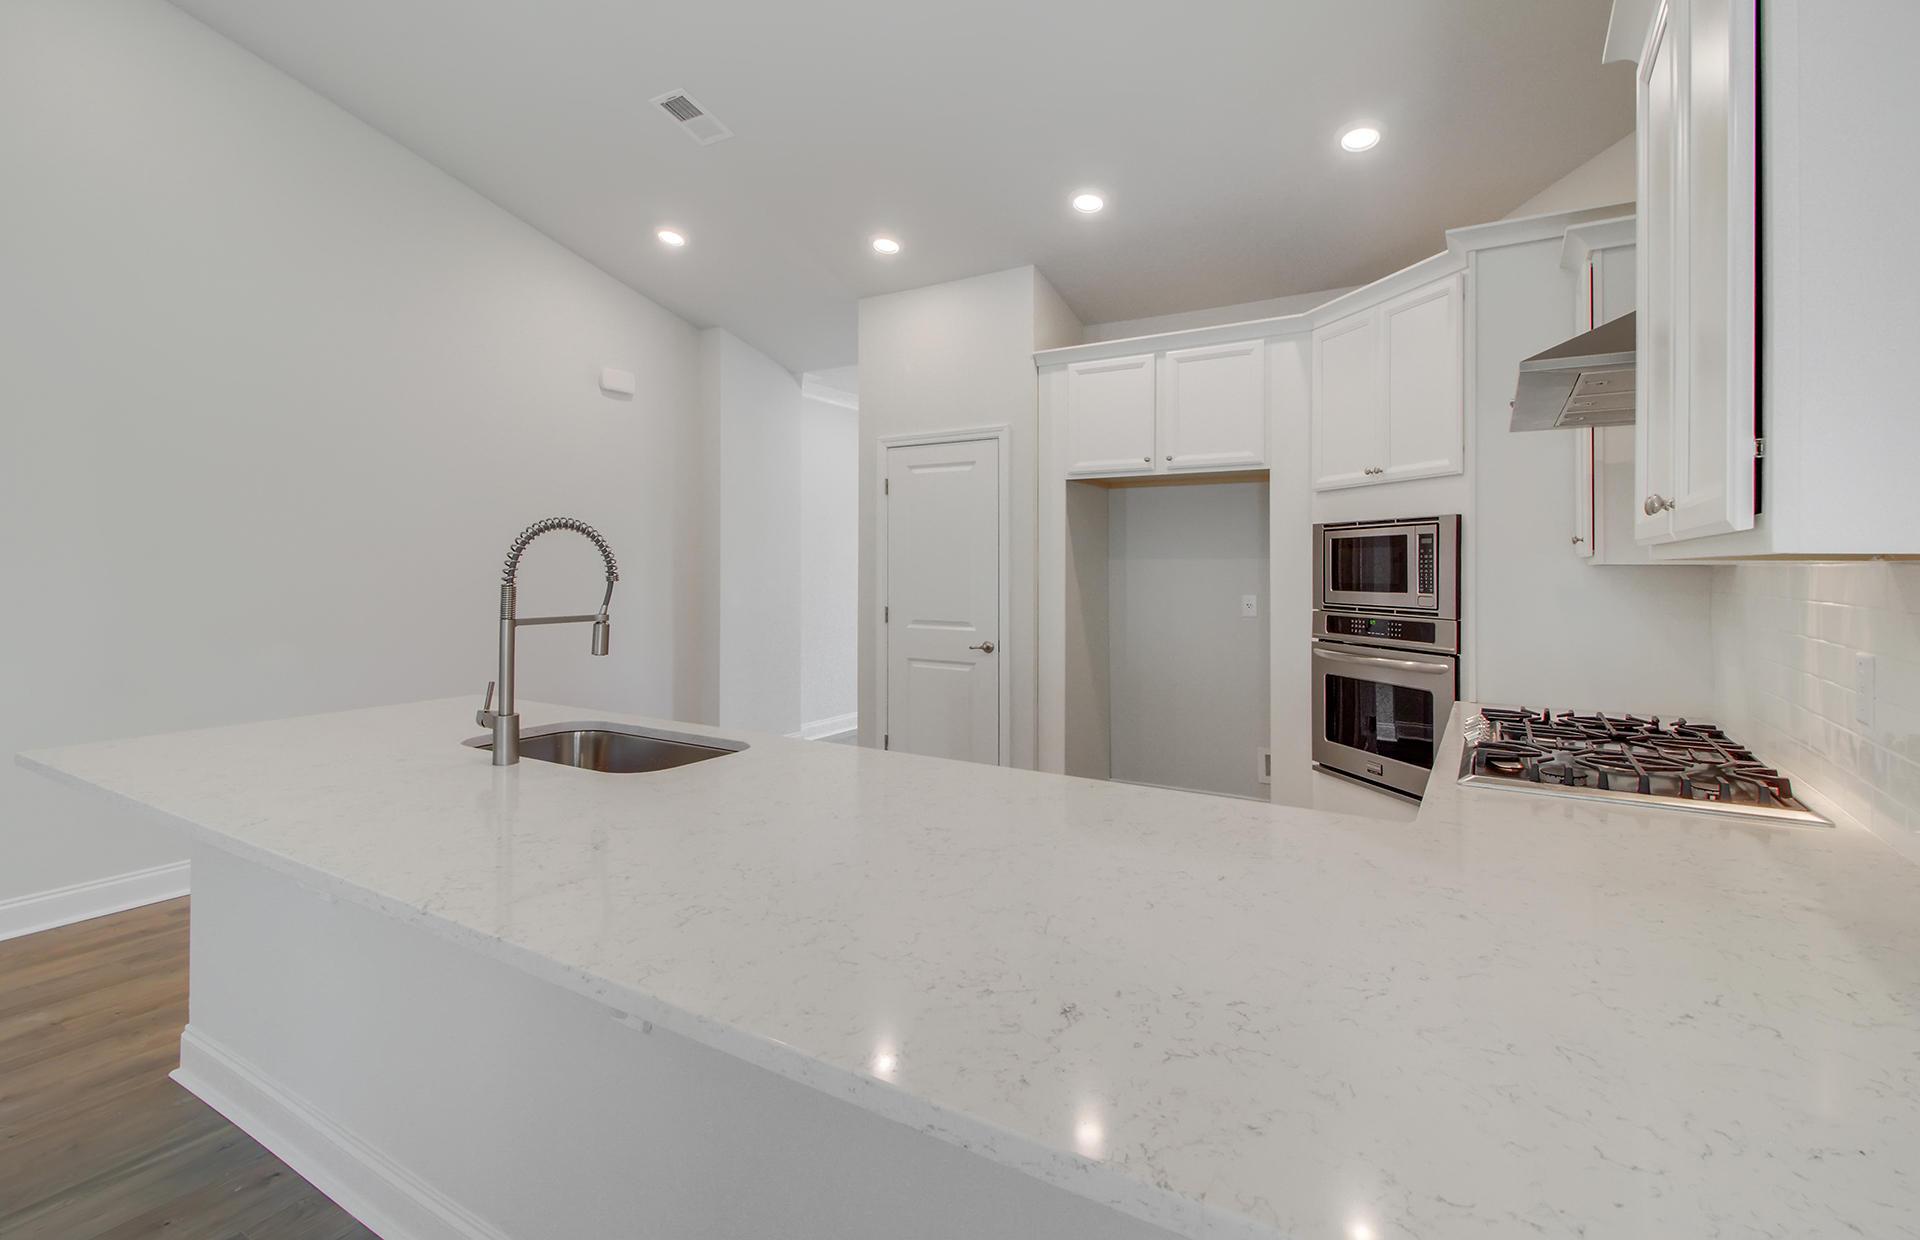 Park West Homes For Sale - 3062 Rice Field, Mount Pleasant, SC - 21